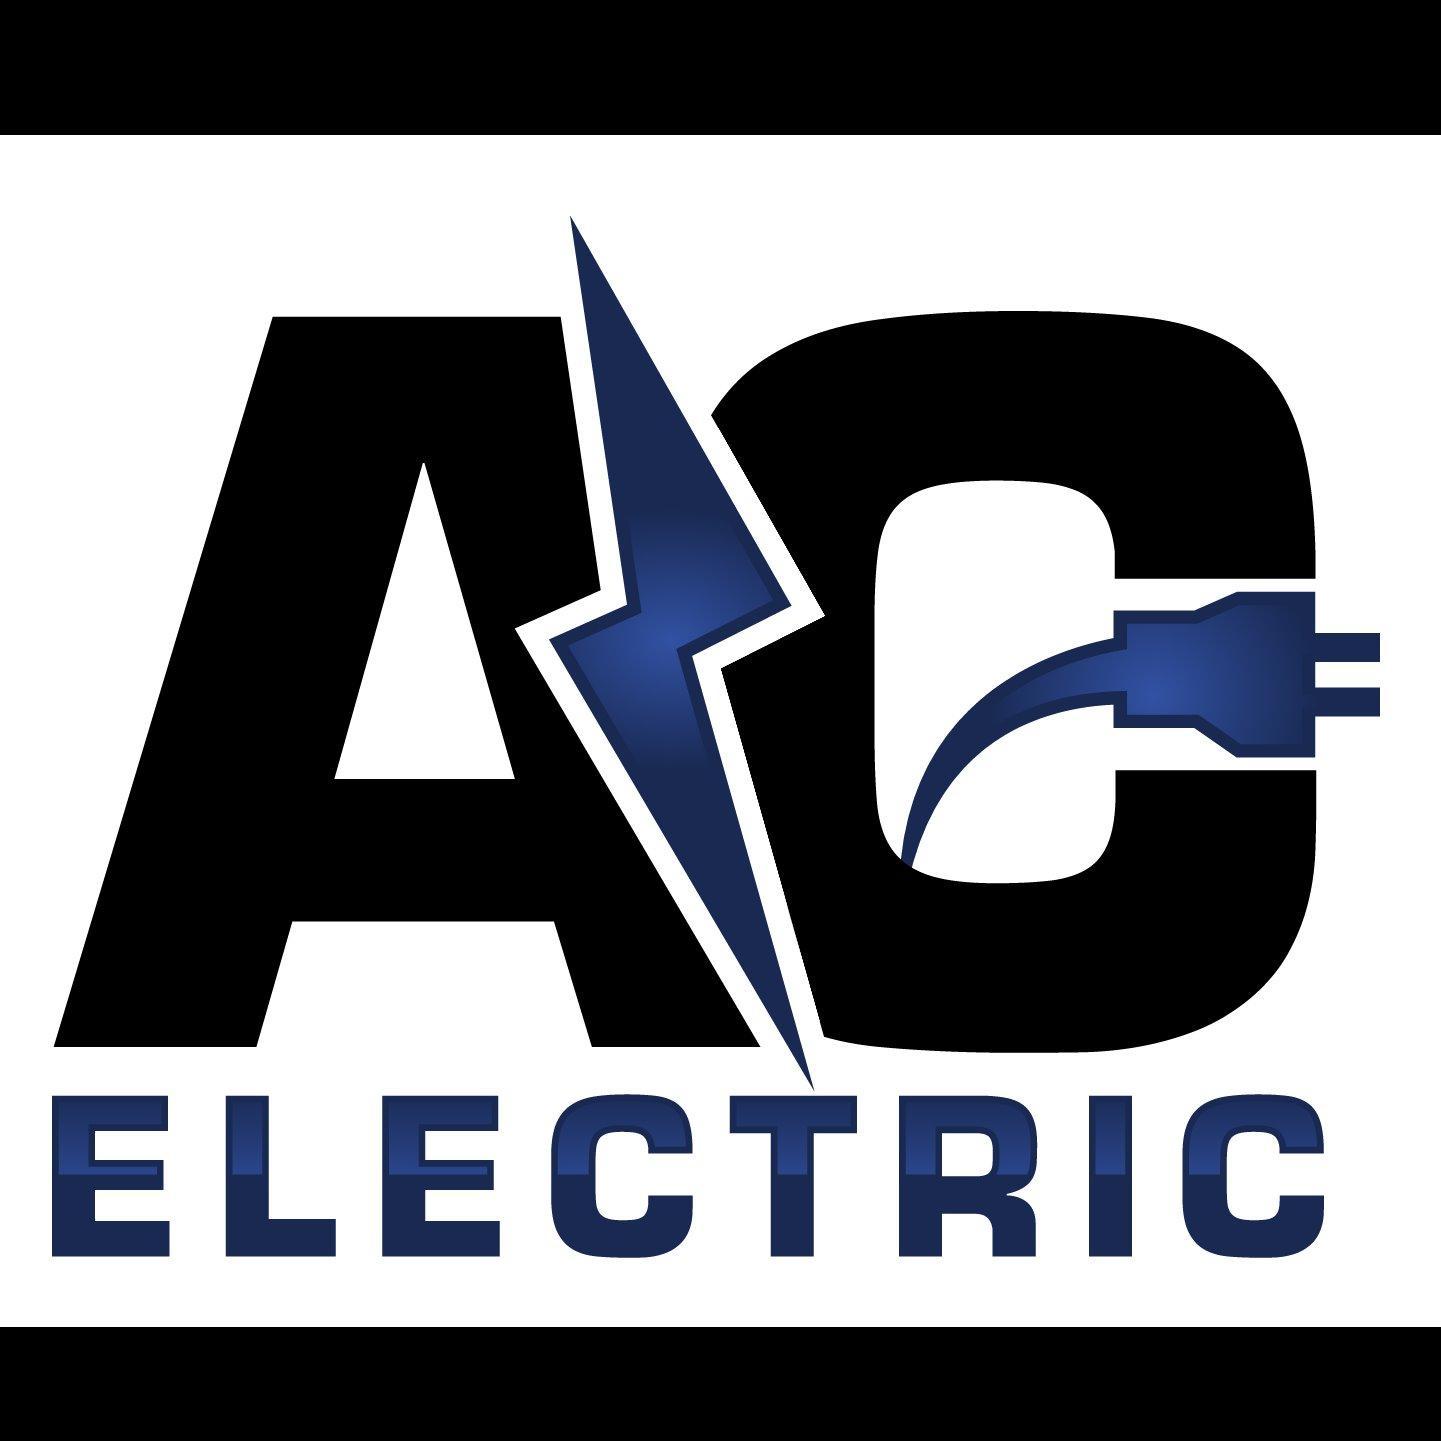 AC ELECTRIC INC.